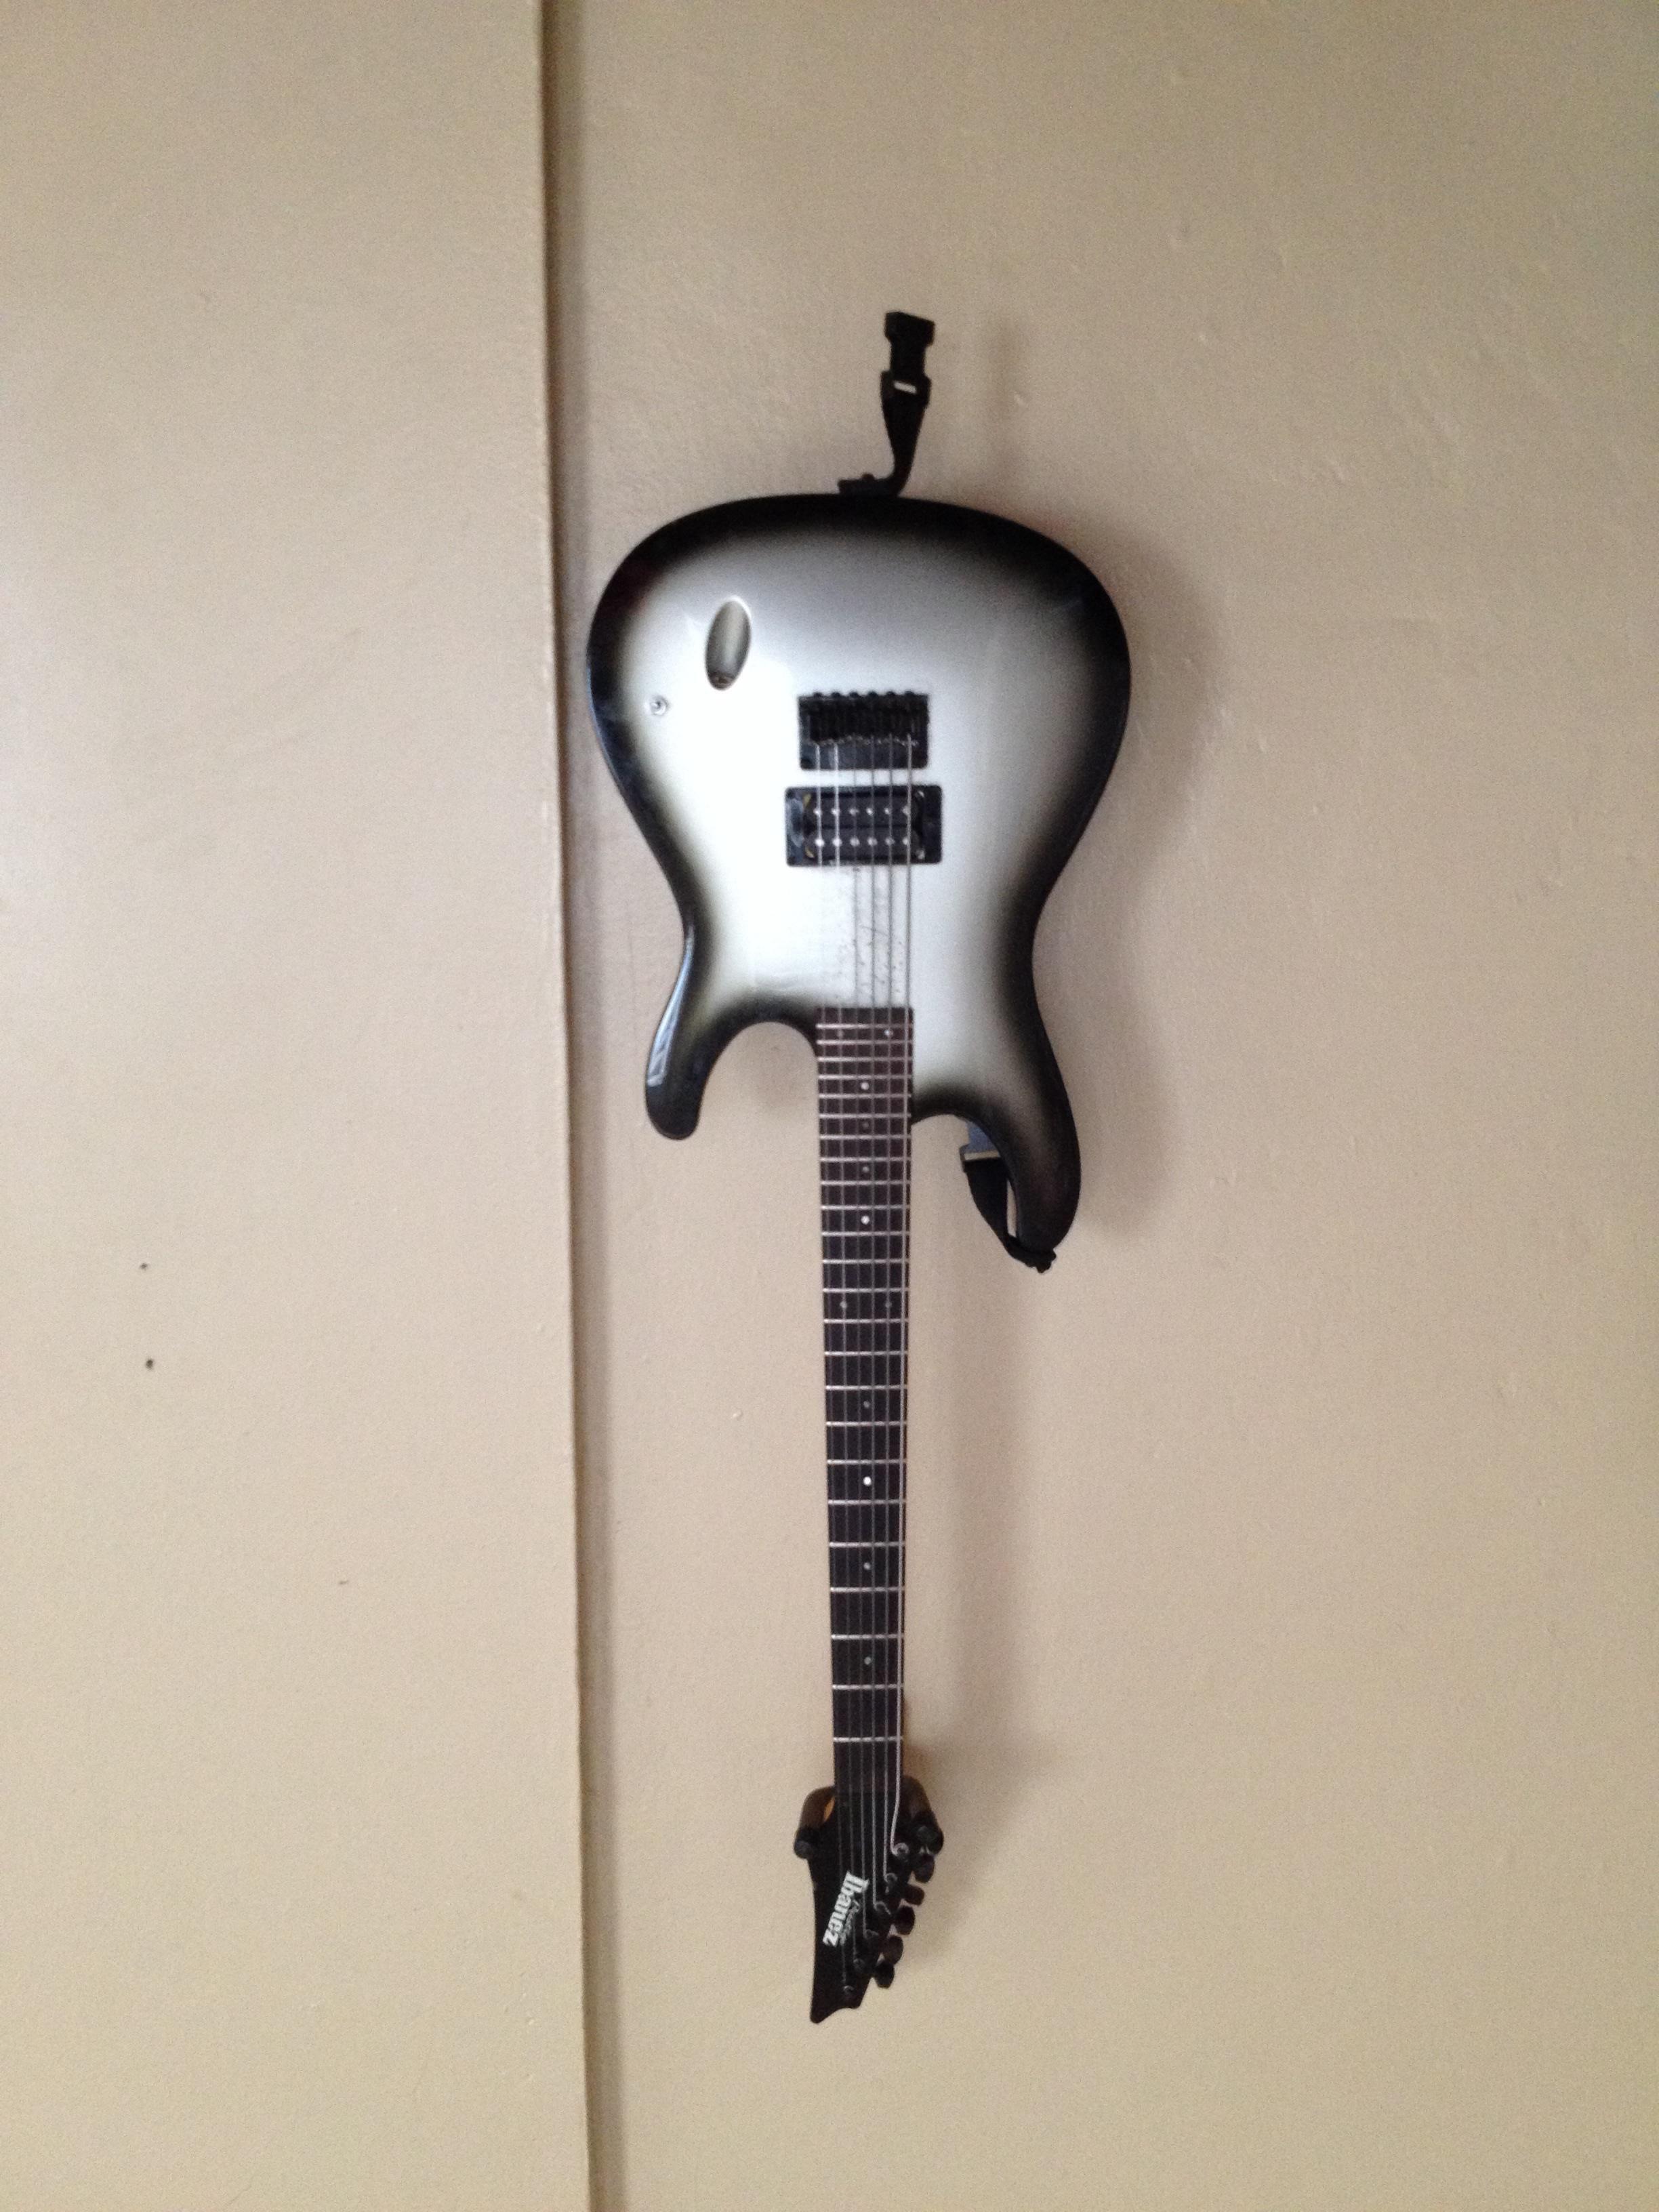 Ibanez Destroyer DT-350 | Guitars | Pinterest | Ibanez, Guitars ...